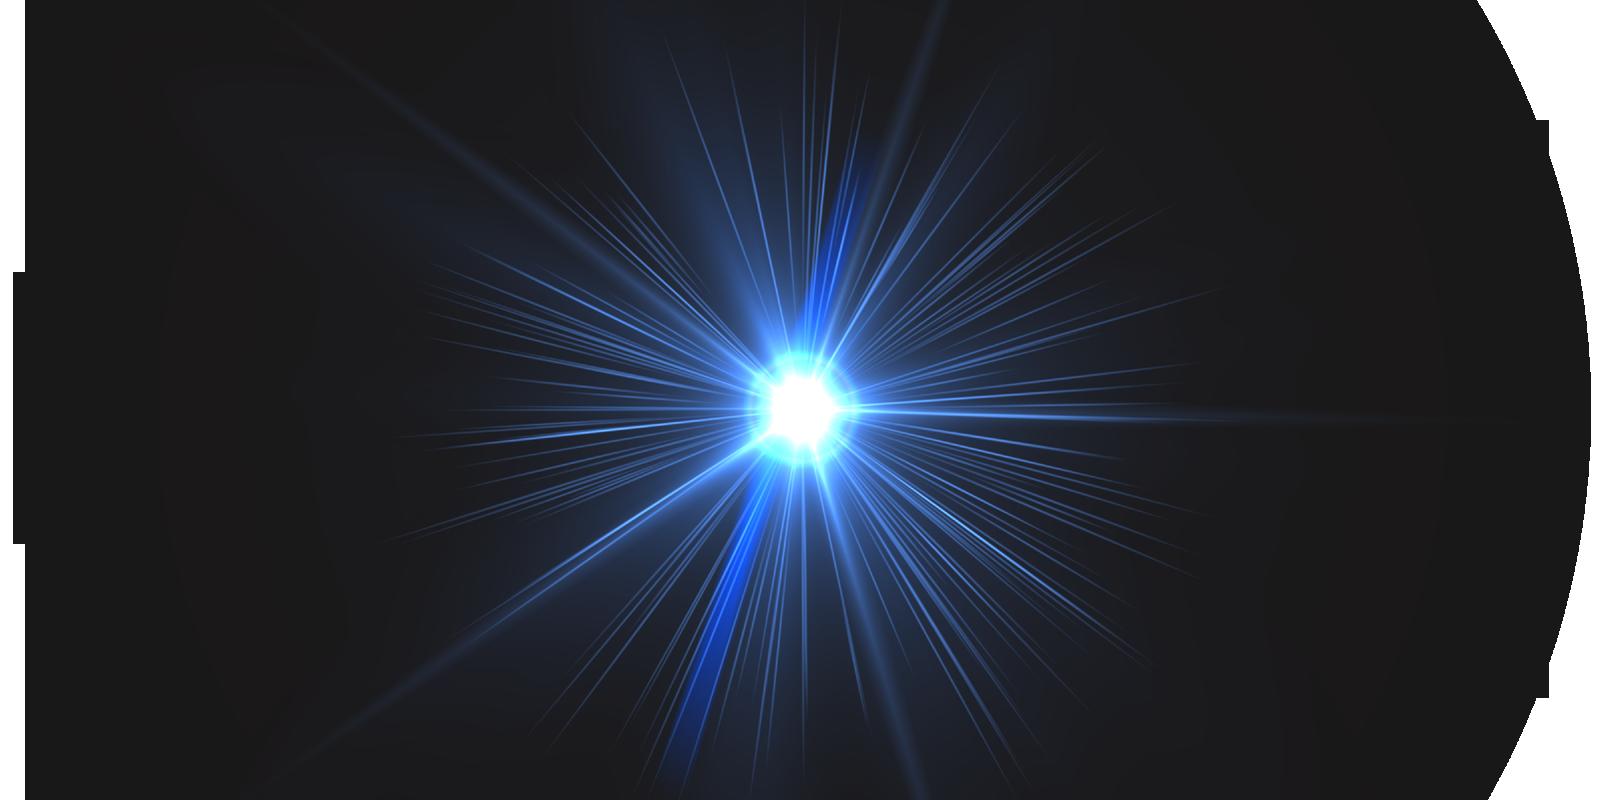 Light PNG Transparent Image - Light PNG